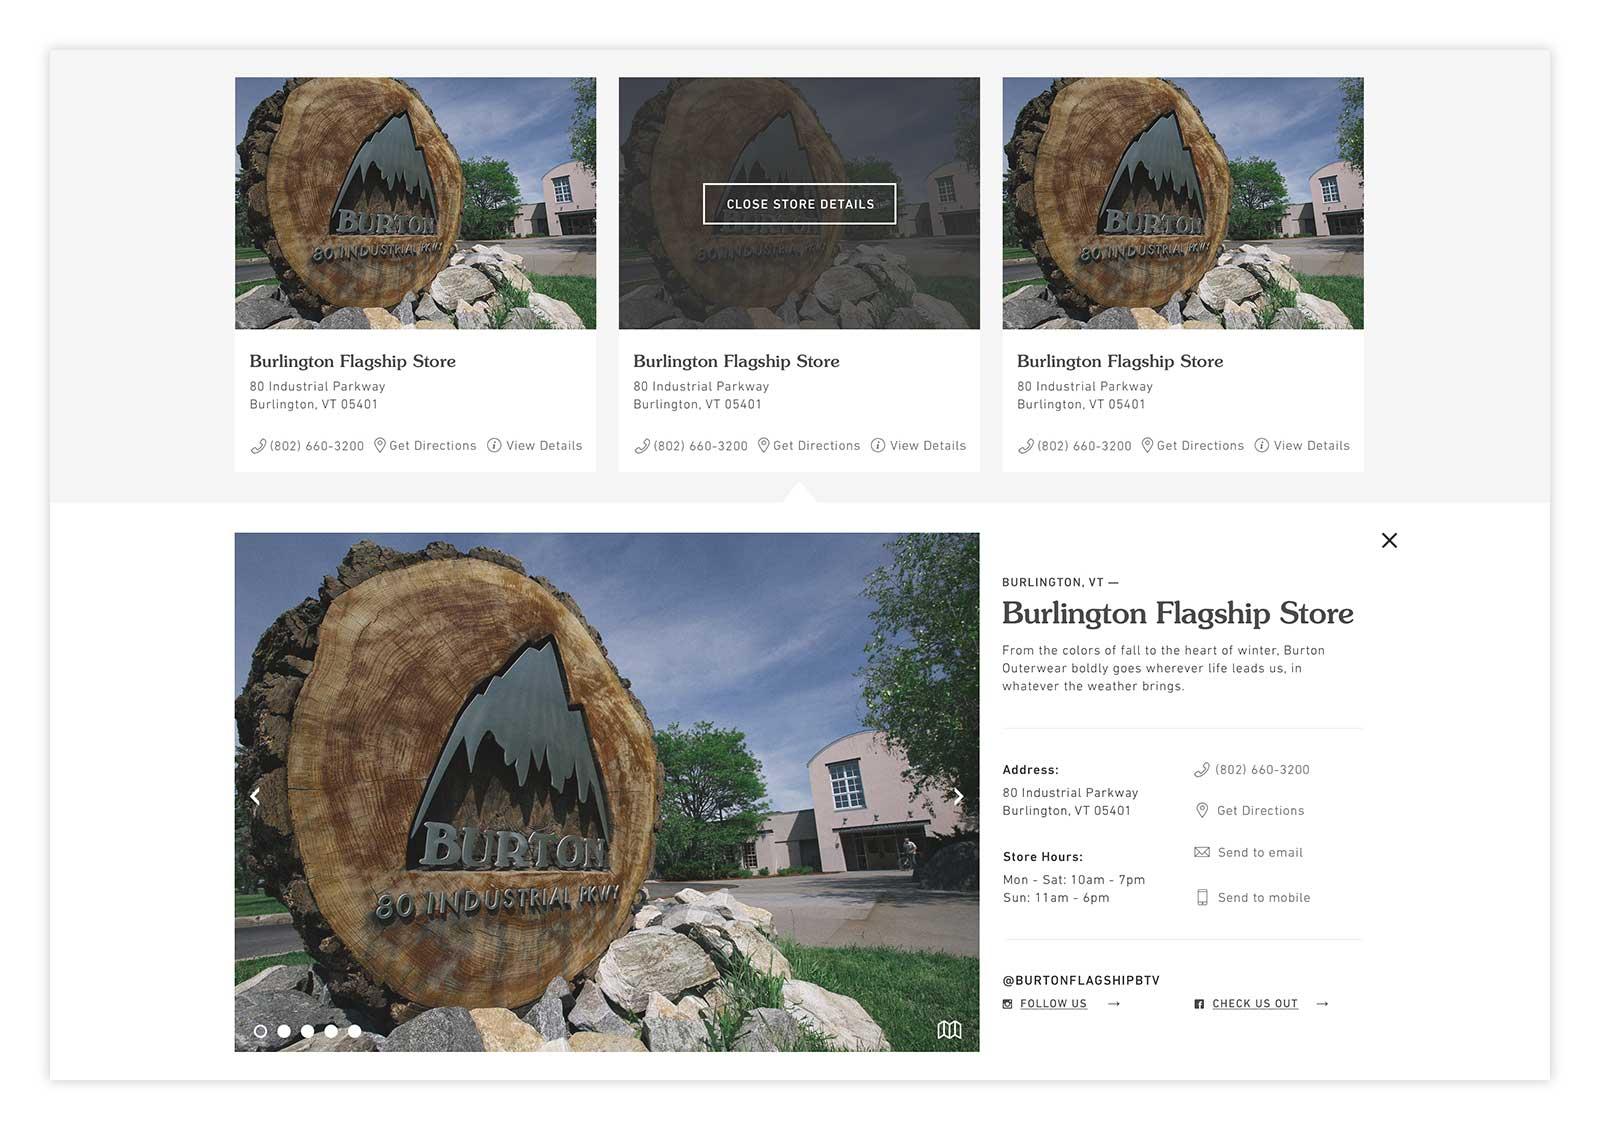 Burton-2017-Store-Locator-Desktop.jpg